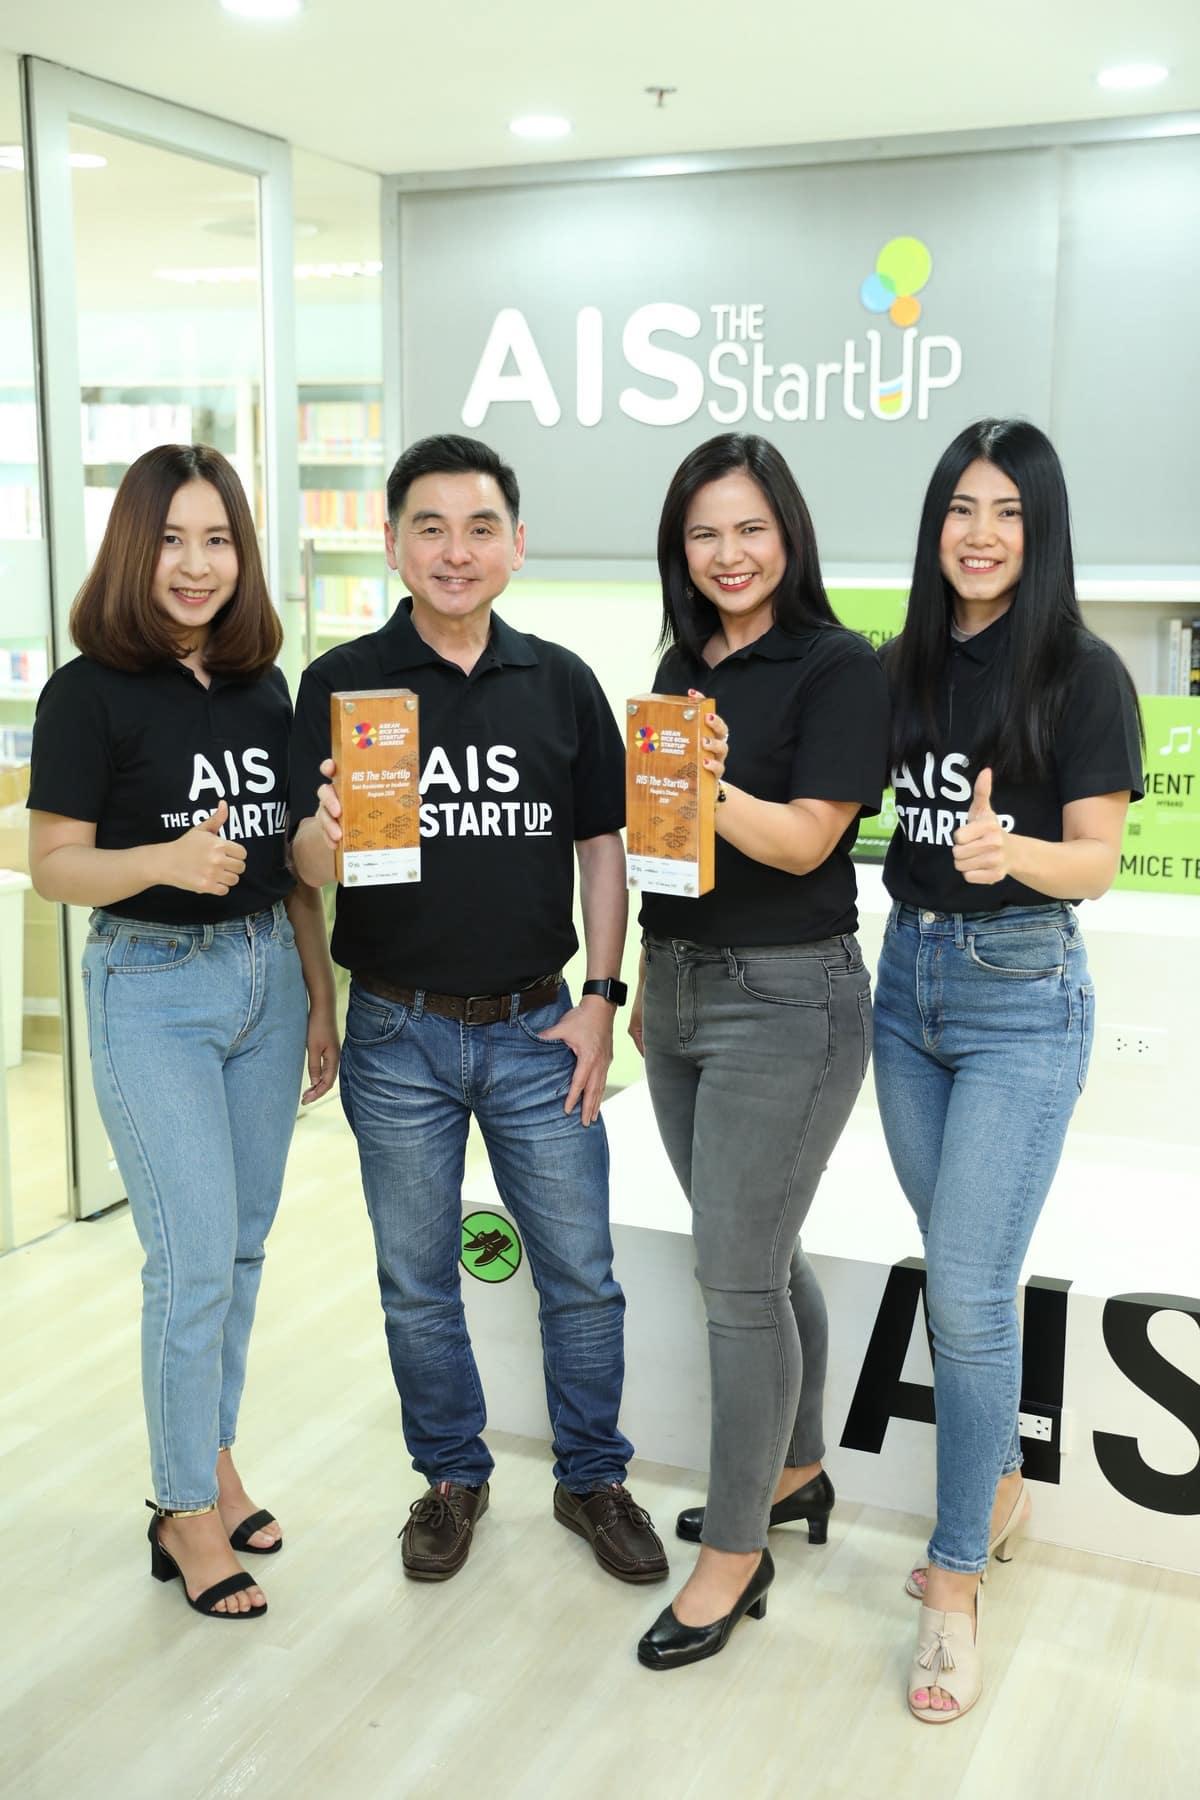 ASEAN AIS The StartUp 00003 - AIS คว้าอีก 2 รางวัล บนเวทีระดับ ASEAN จากโครงการ AIS The StartUp